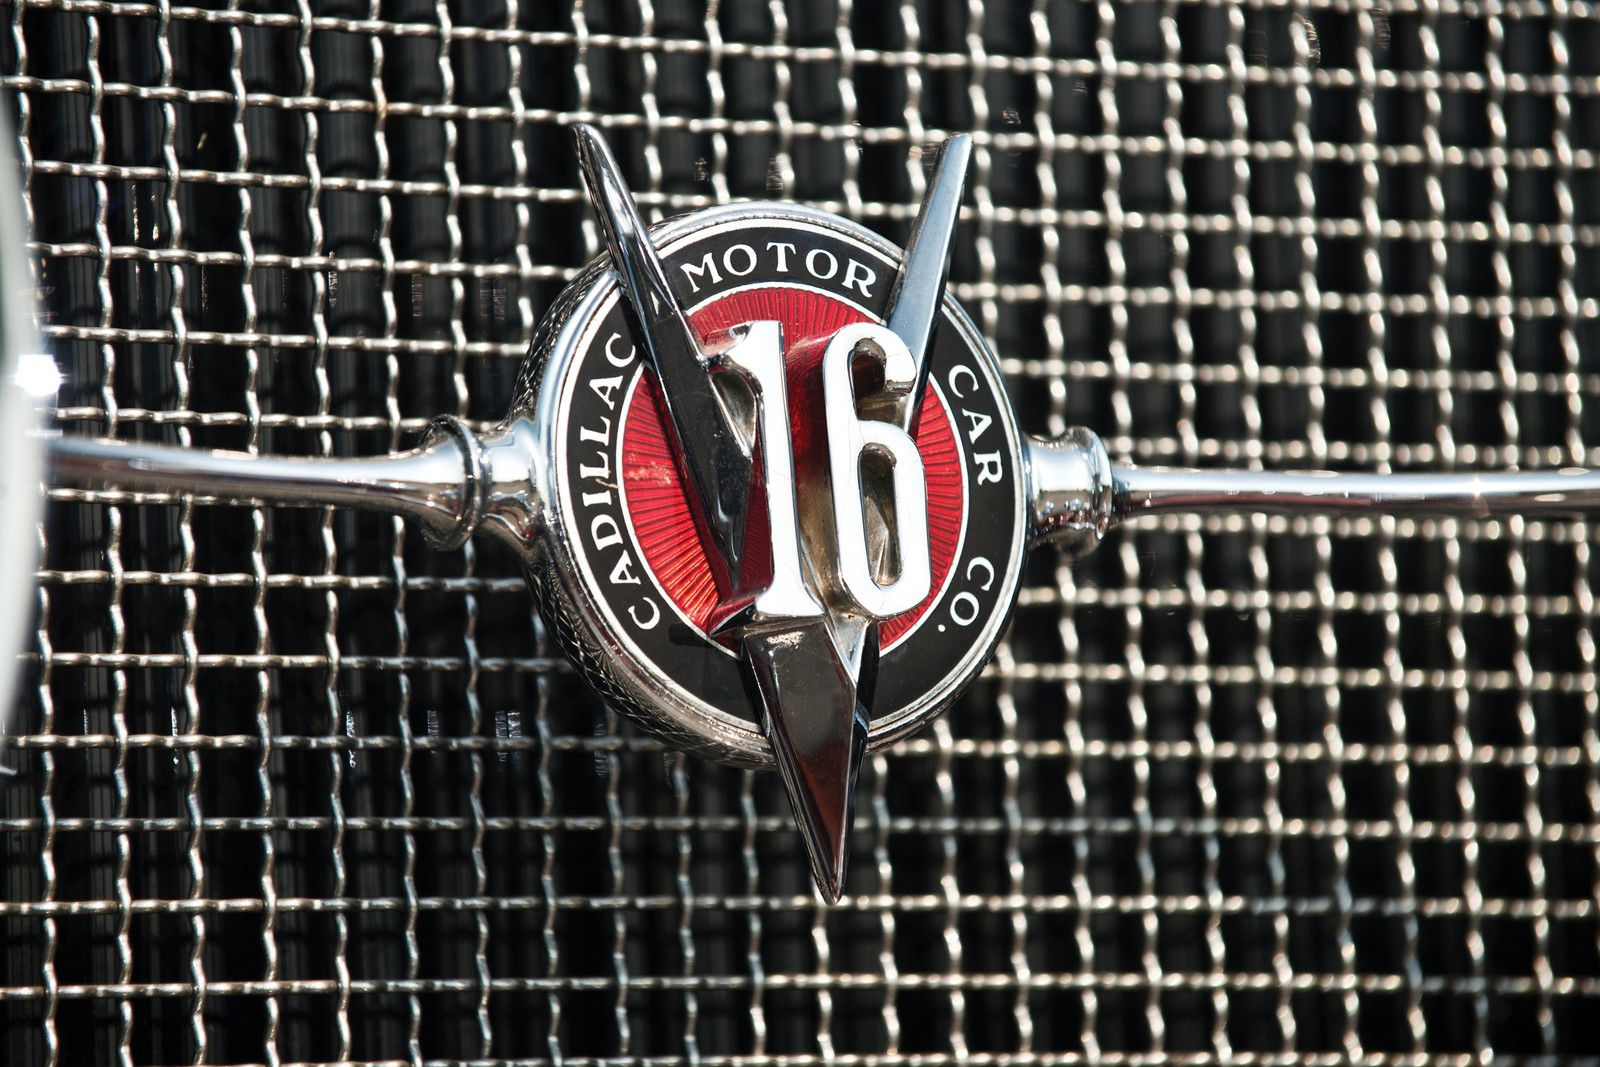 VOITURES DE LEGENDE (1204) : CADILLAC  V16 SERIES 452  SPECIALE DUAL COWL PHAETON By FLEETWOOD - 1931